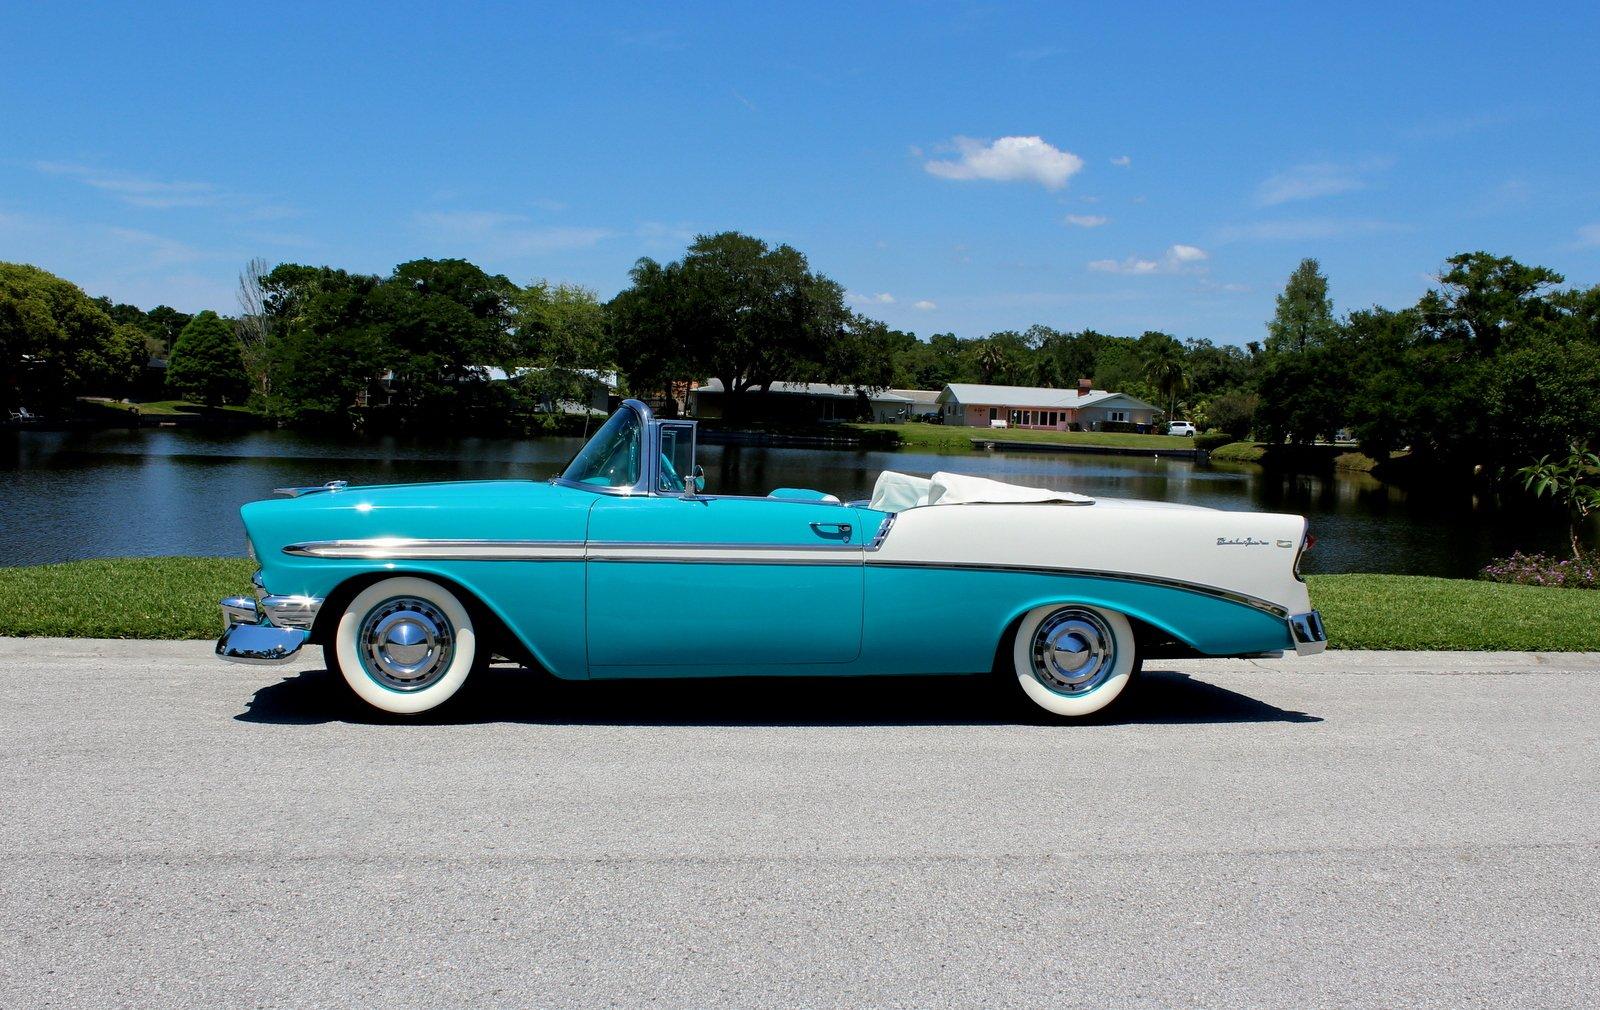 Superb 1956 Chevrolet Belair Pjs Autoworld Beutiful Home Inspiration Semekurdistantinfo